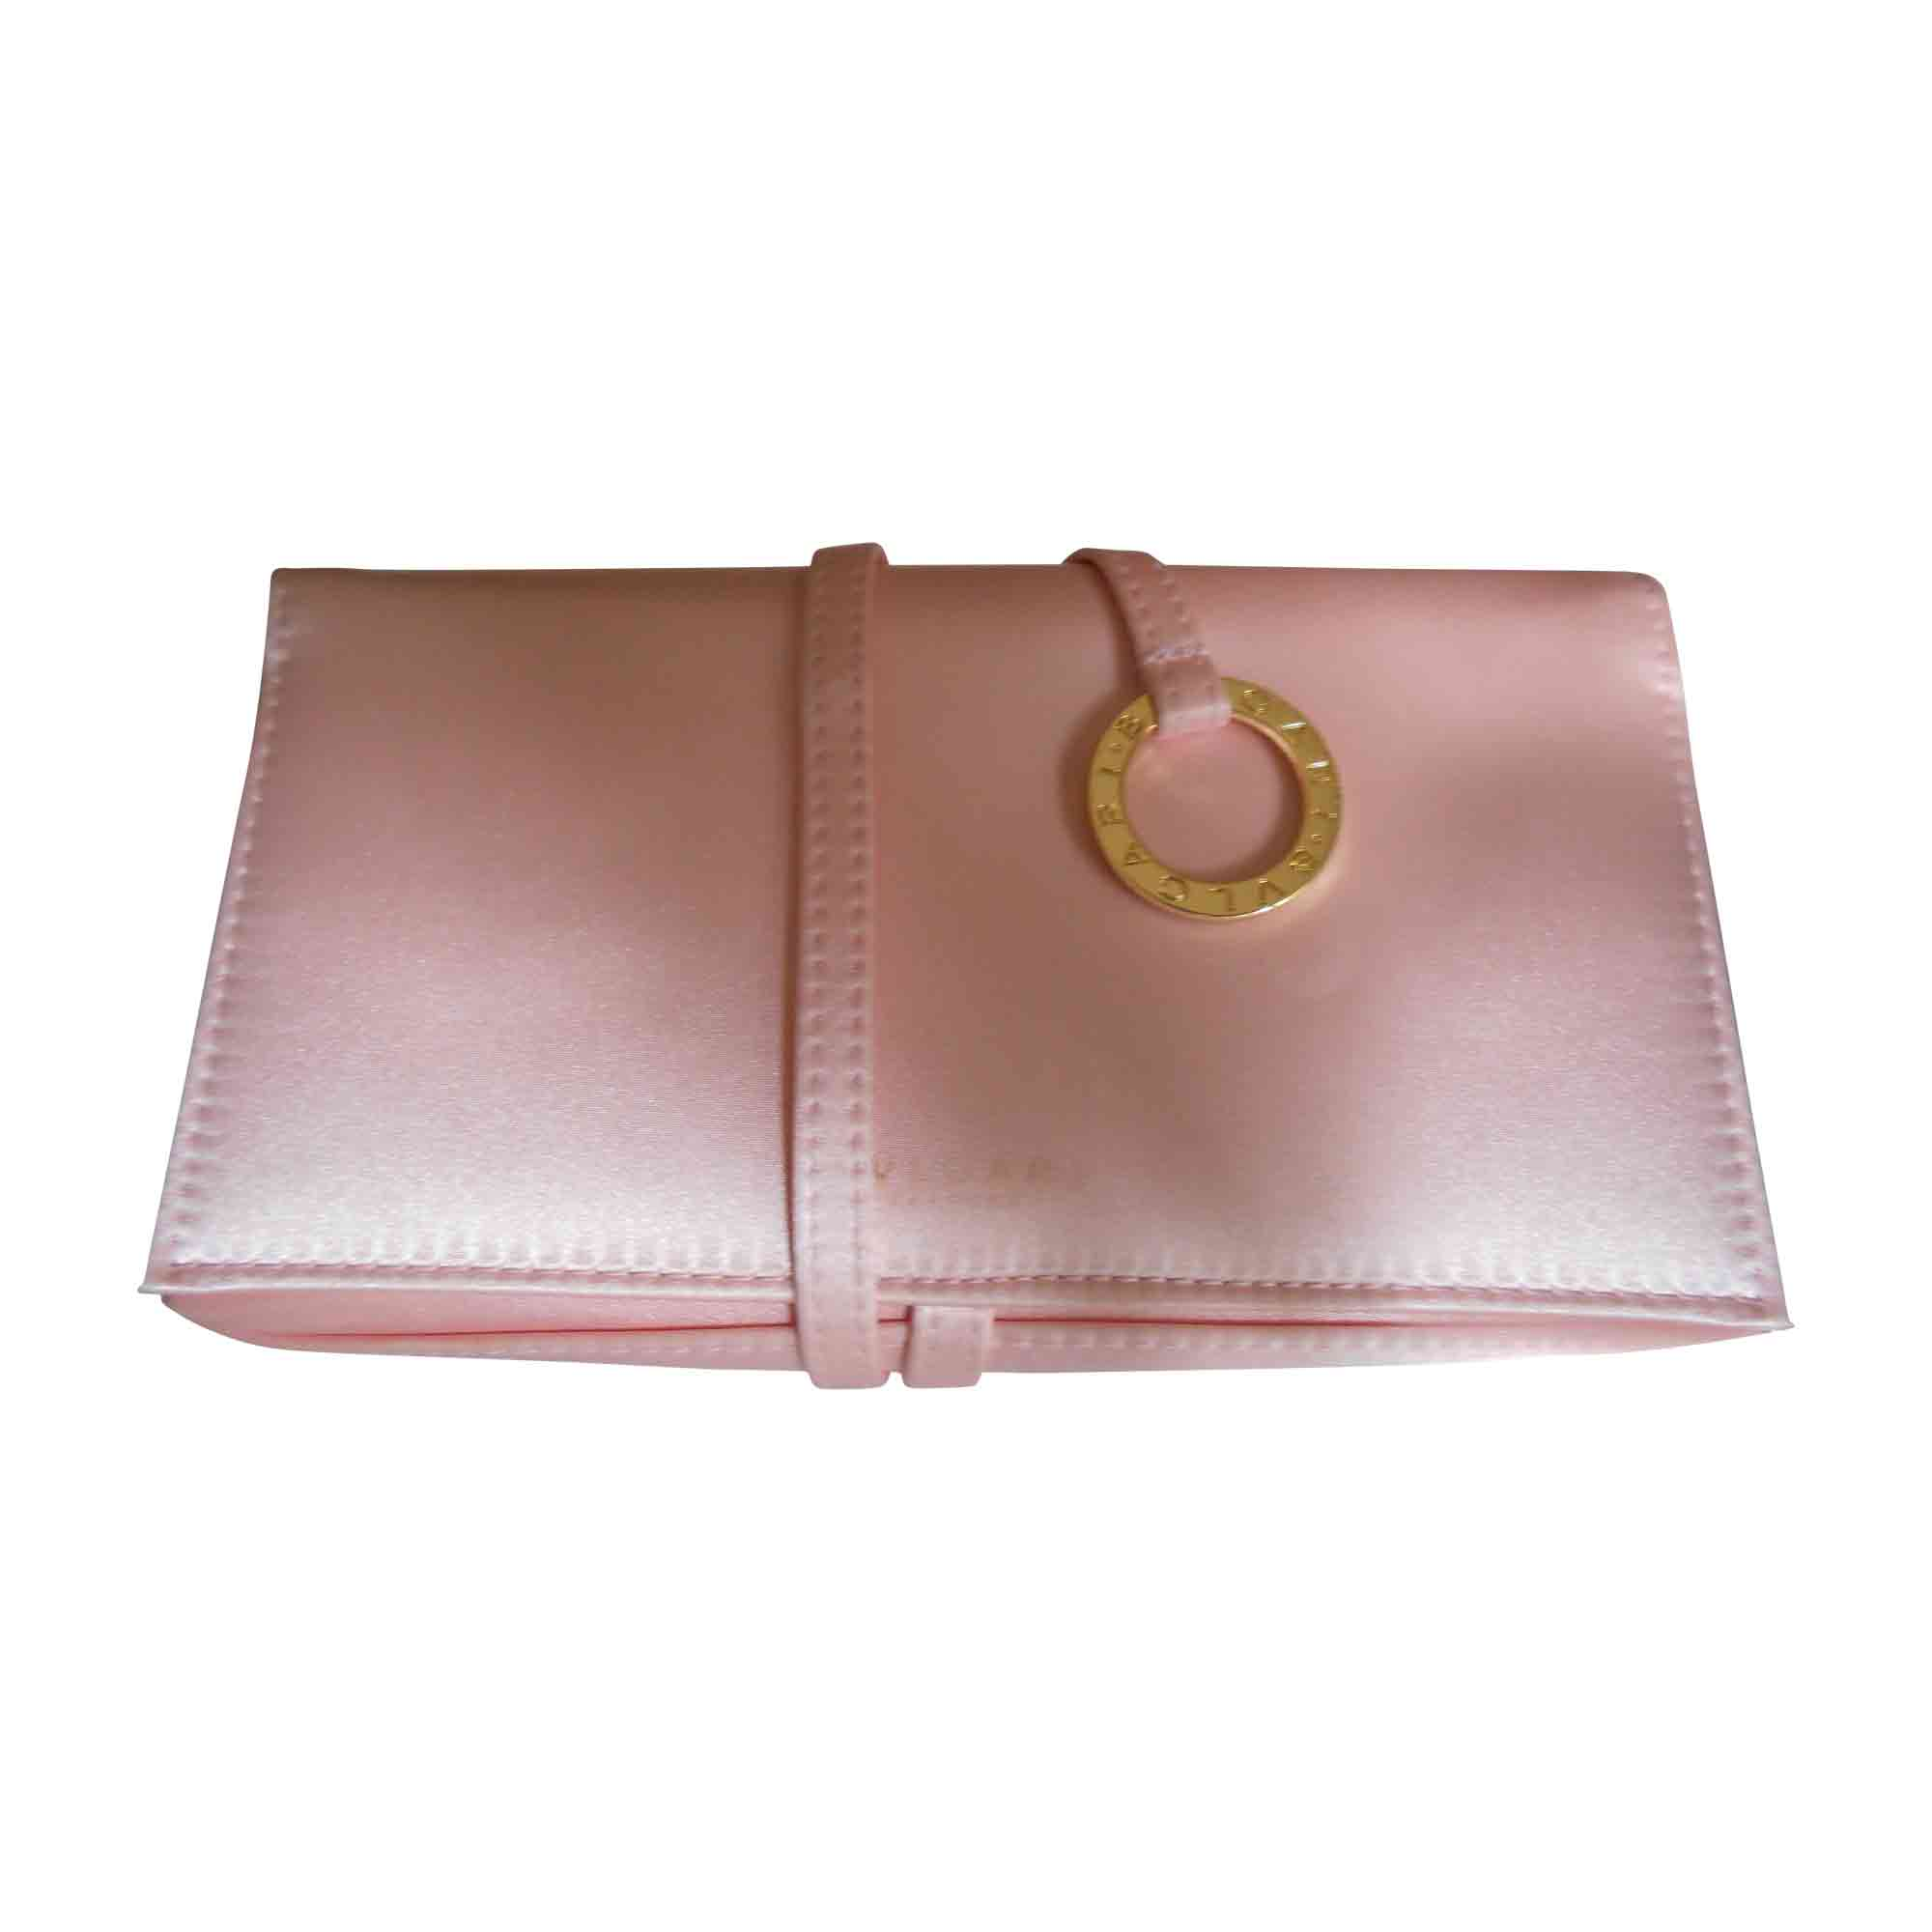 sac pochette en tissu bulgari rose vendu par evad 6167284. Black Bedroom Furniture Sets. Home Design Ideas